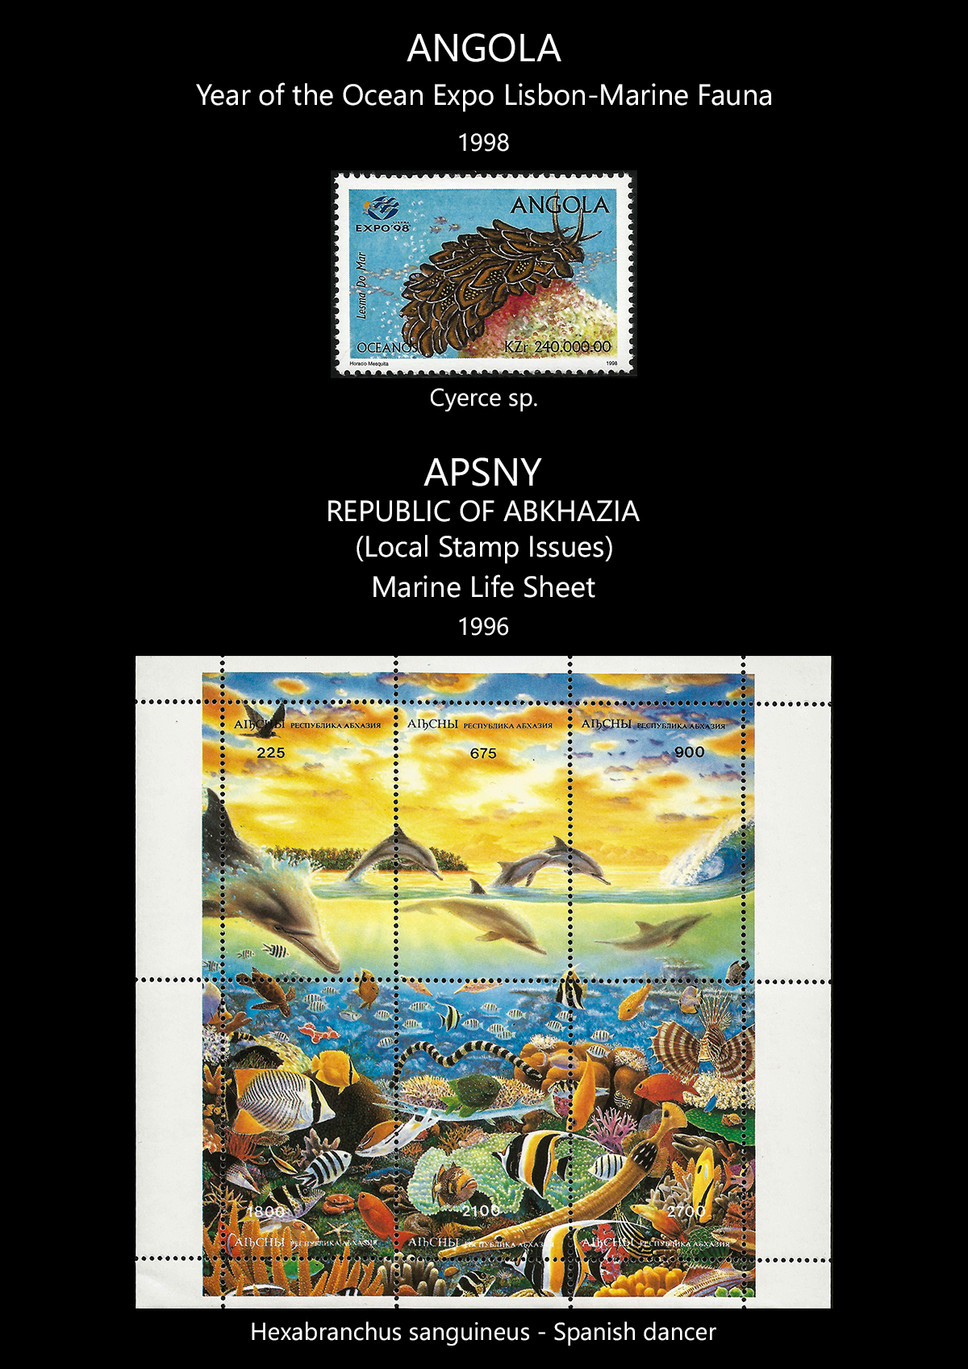 angola + apsny Stamps & FDC